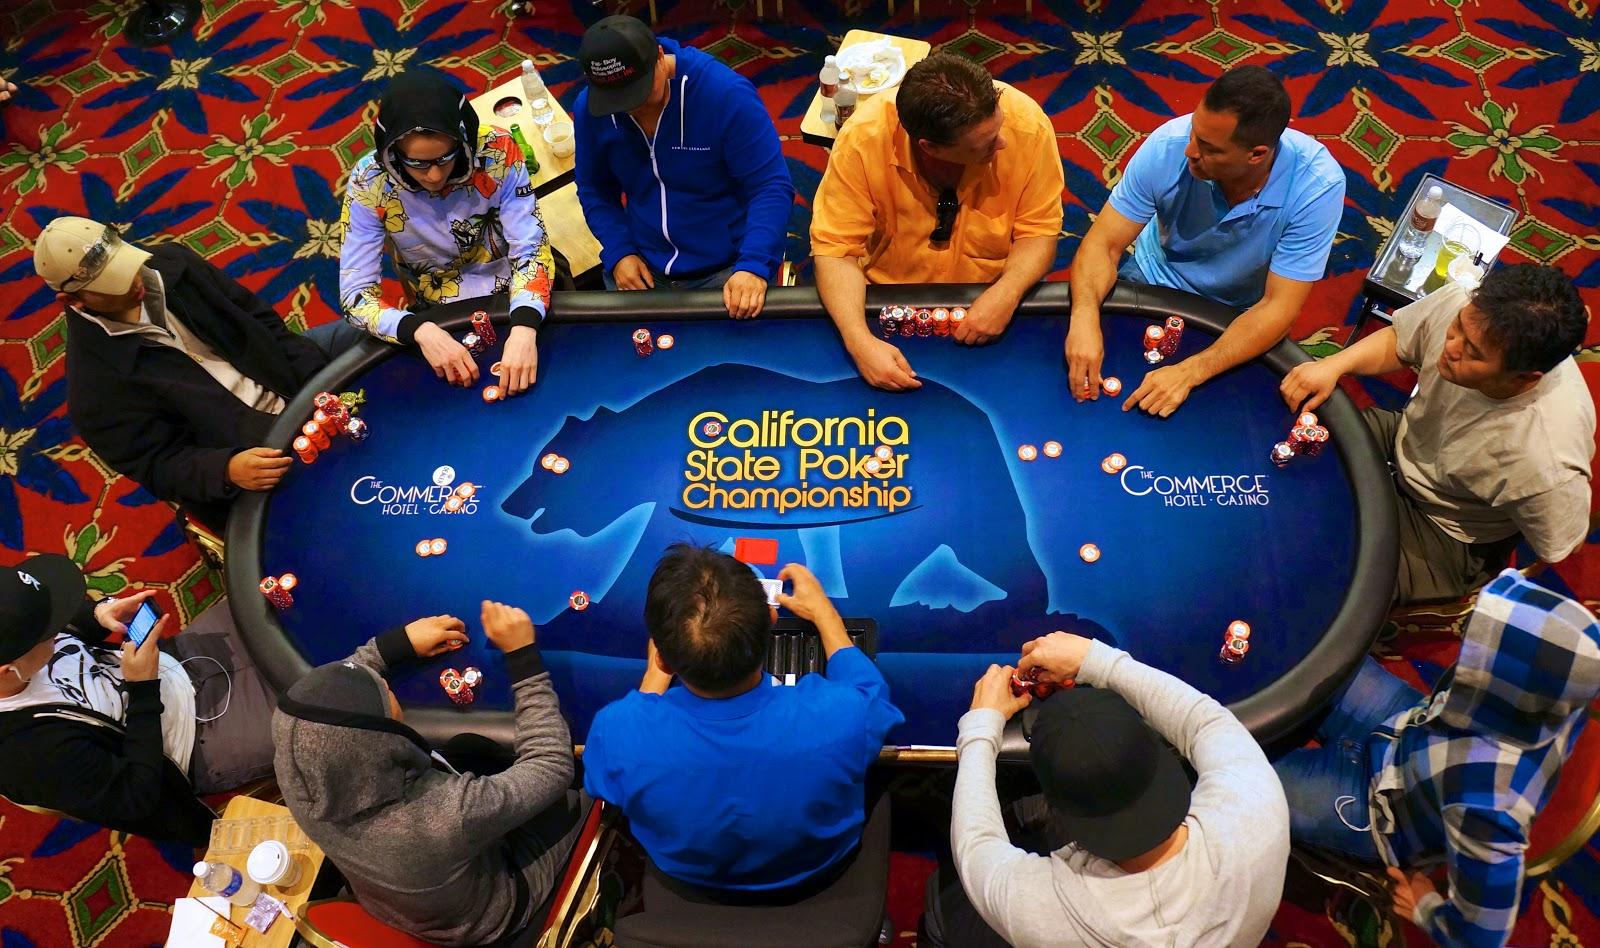 Commerce casino no limit casino dvd rip royale